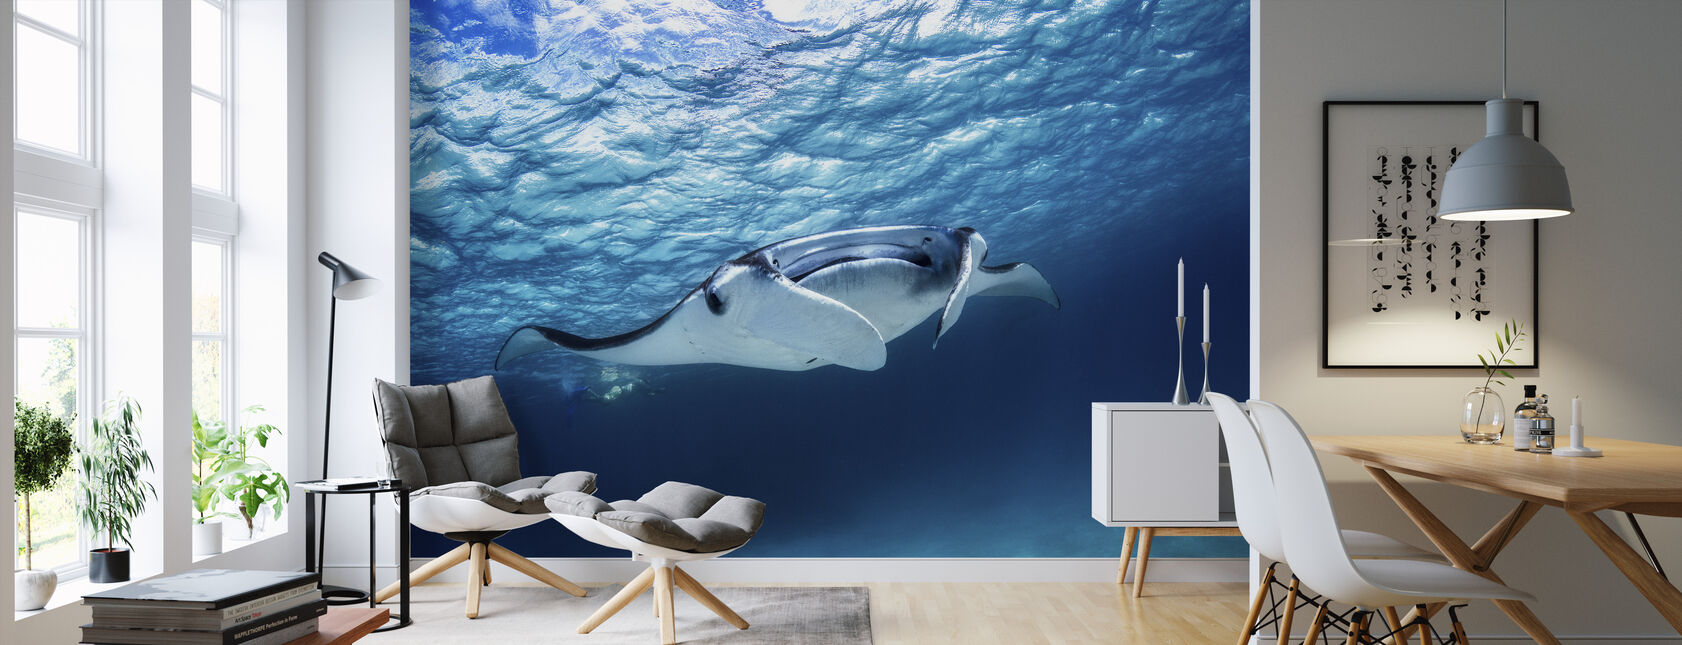 Vattendjur